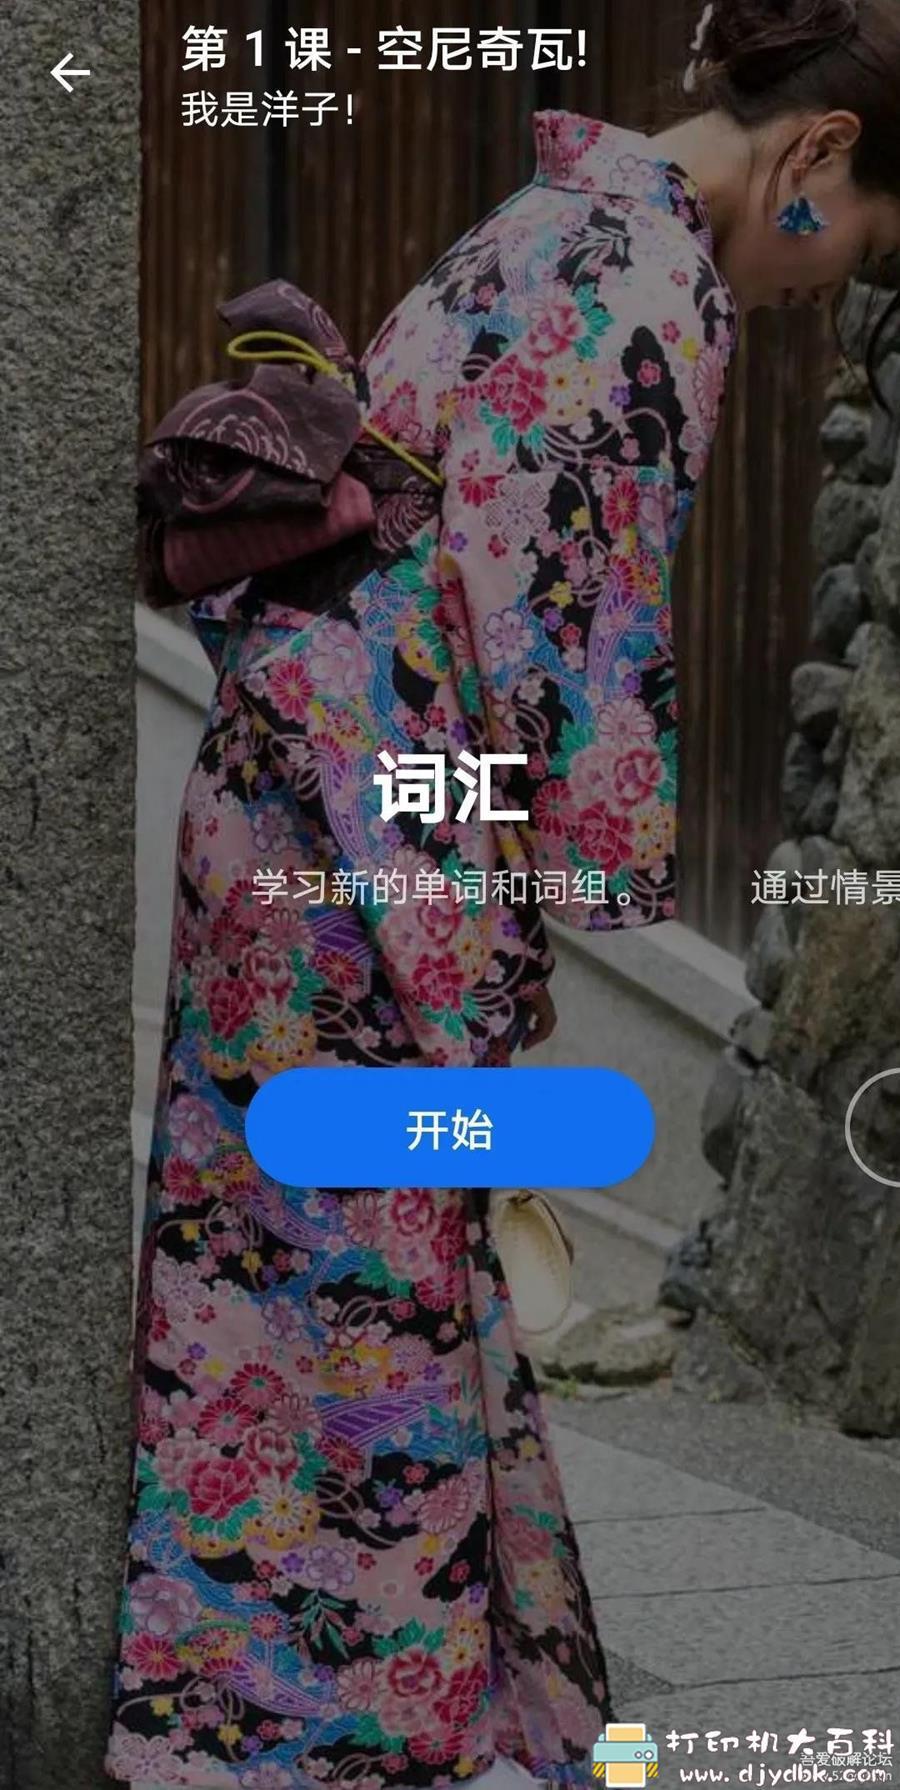 [Android]学习外语的软件 博说【已破解永久VIP】图片 No.4